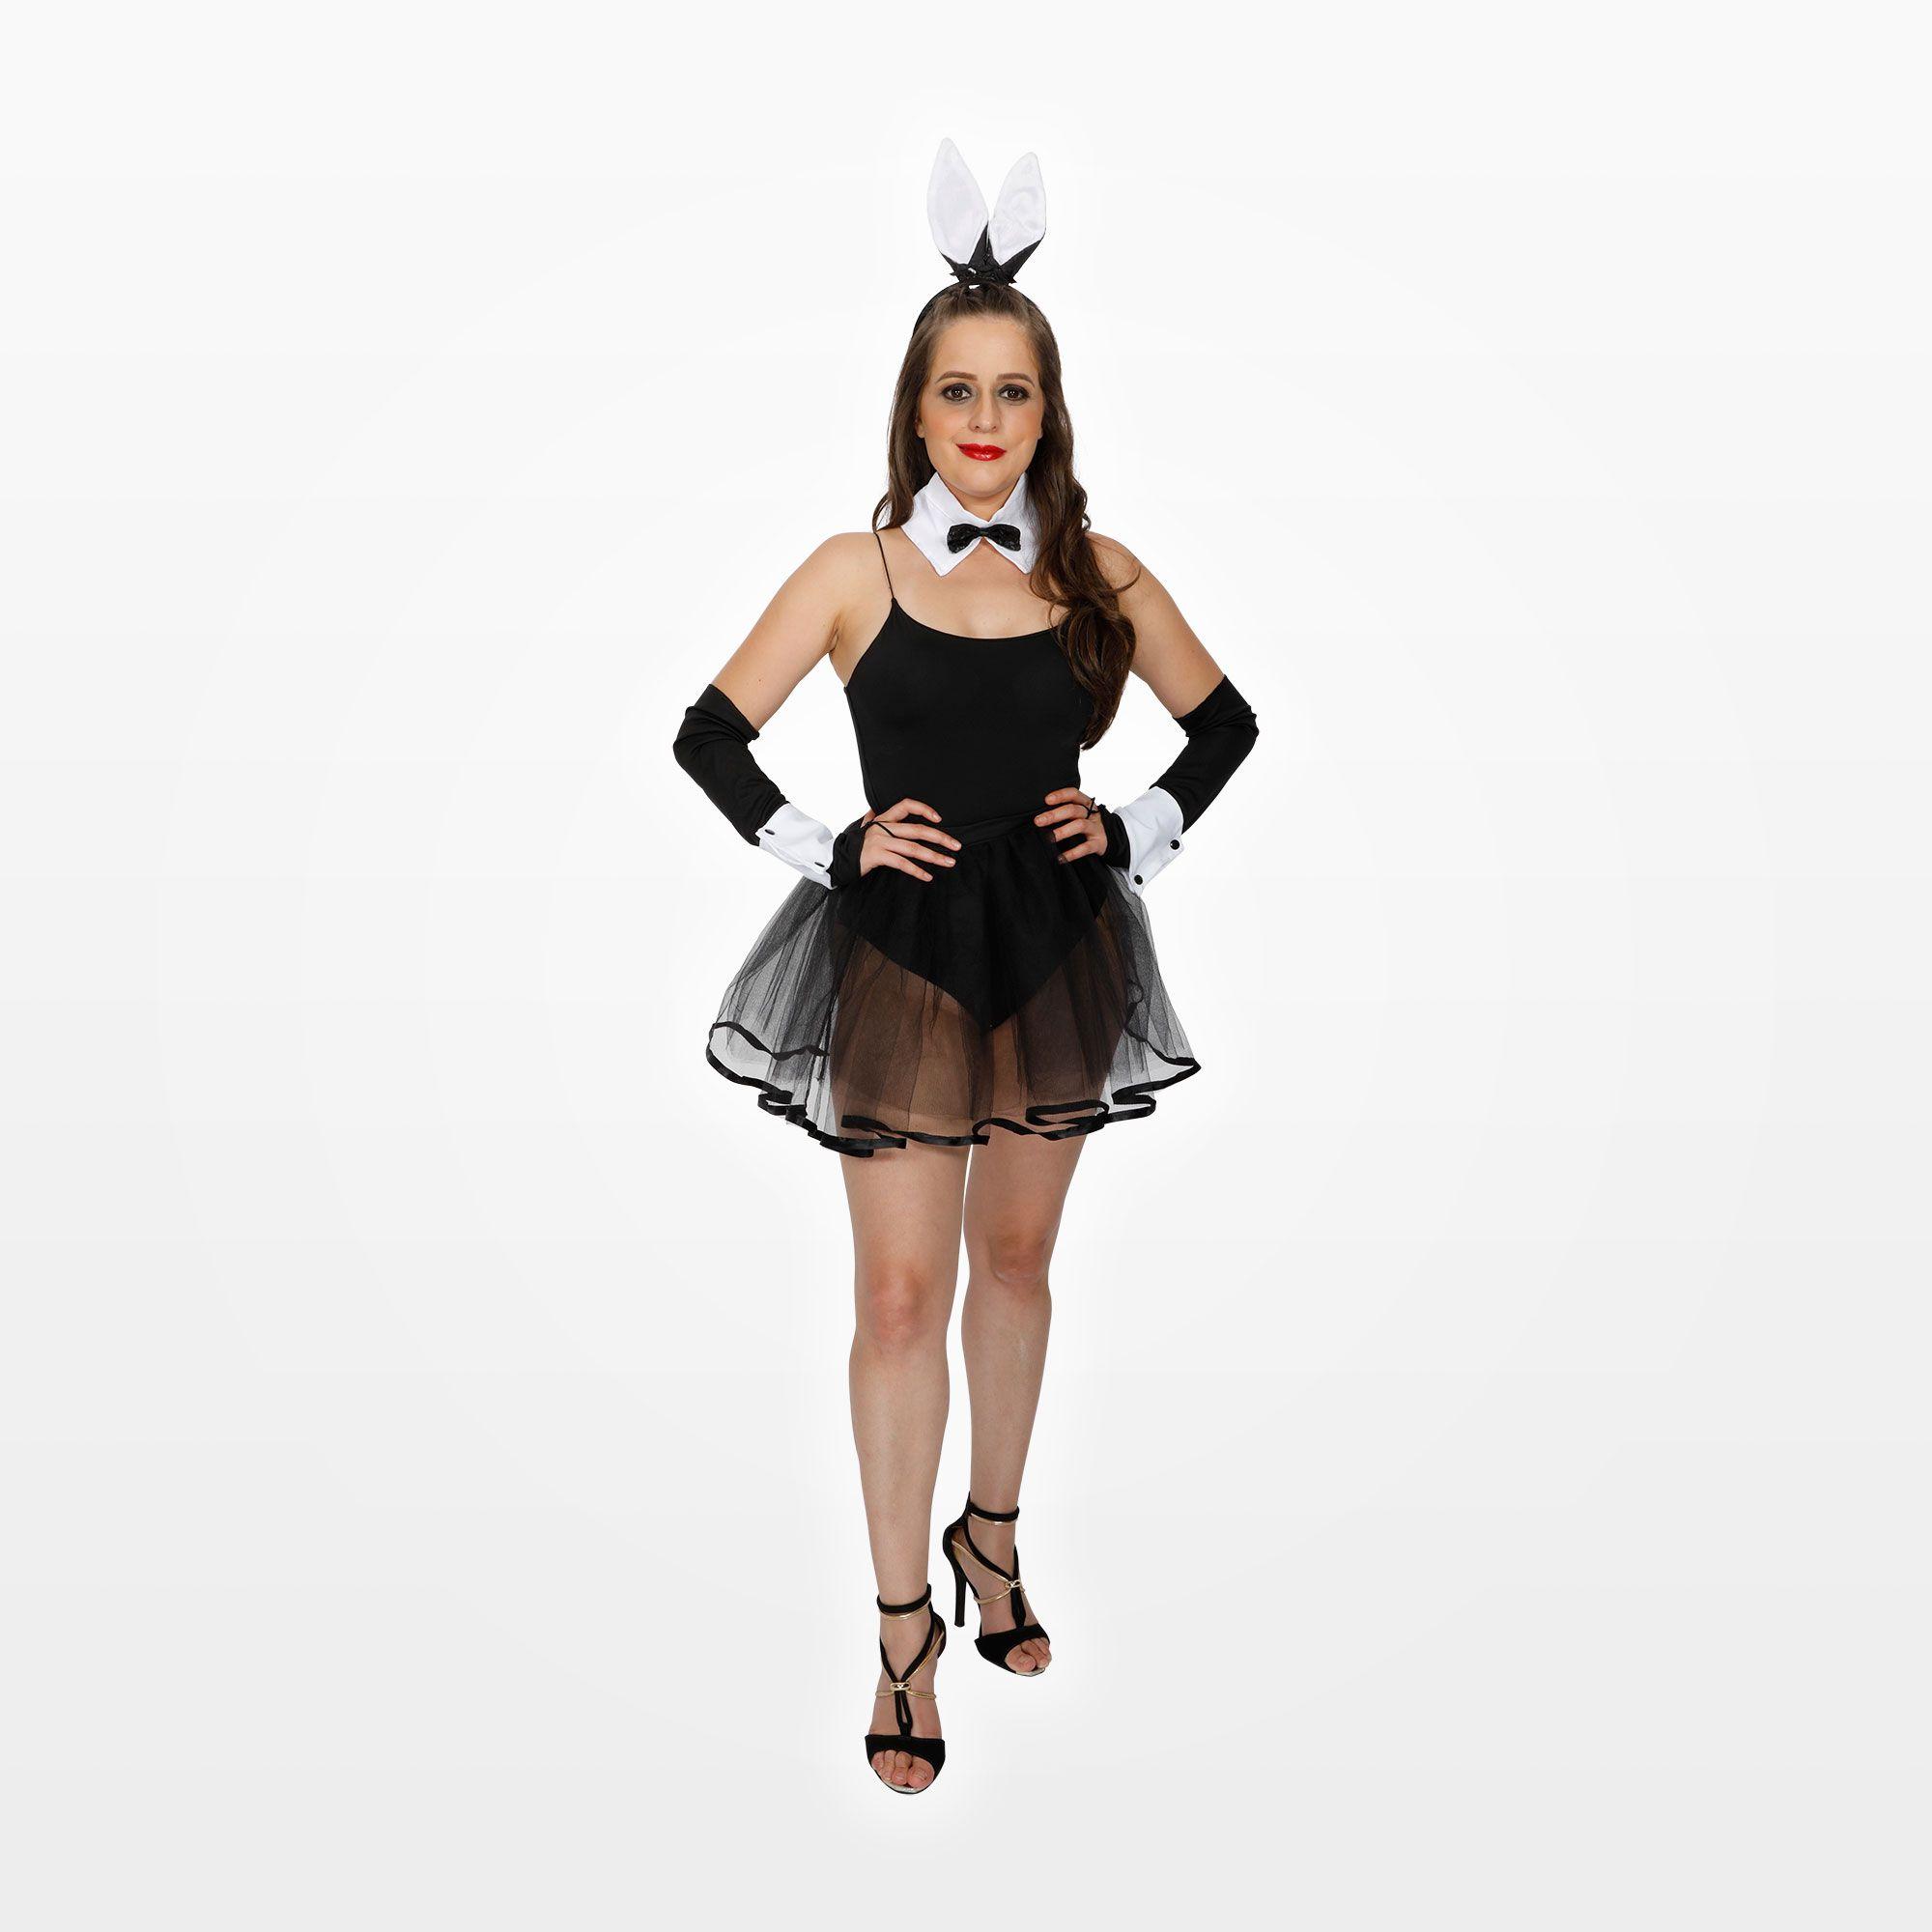 Fantasia Coelhinha com Body Preto, Tiara, Gravata, Saia e Luvas Adulto